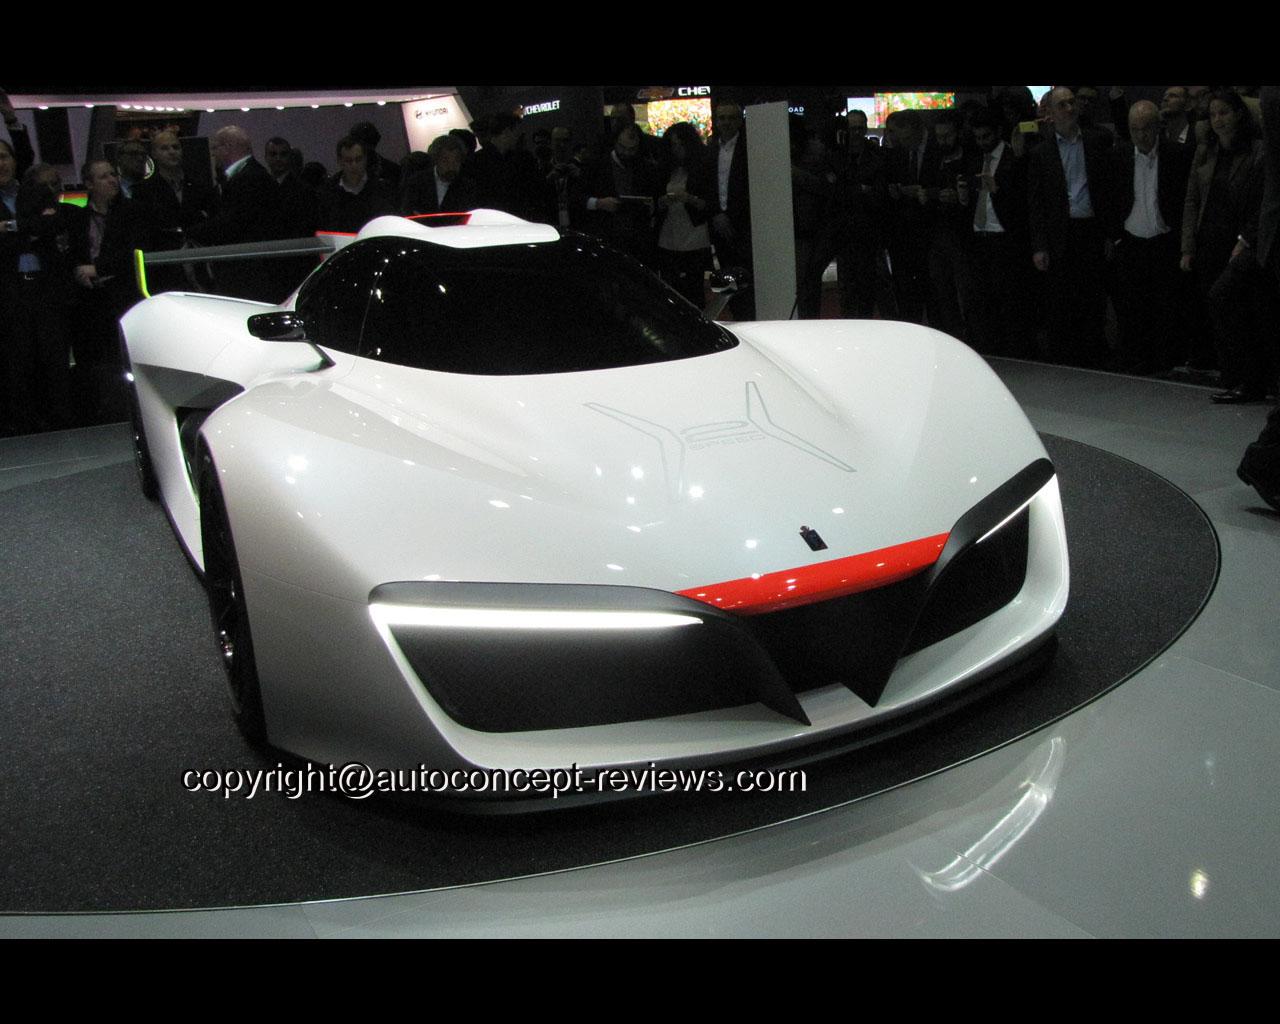 Pininfarina H2 Speed Concept: Pininfarina H2 Speed Concept Car